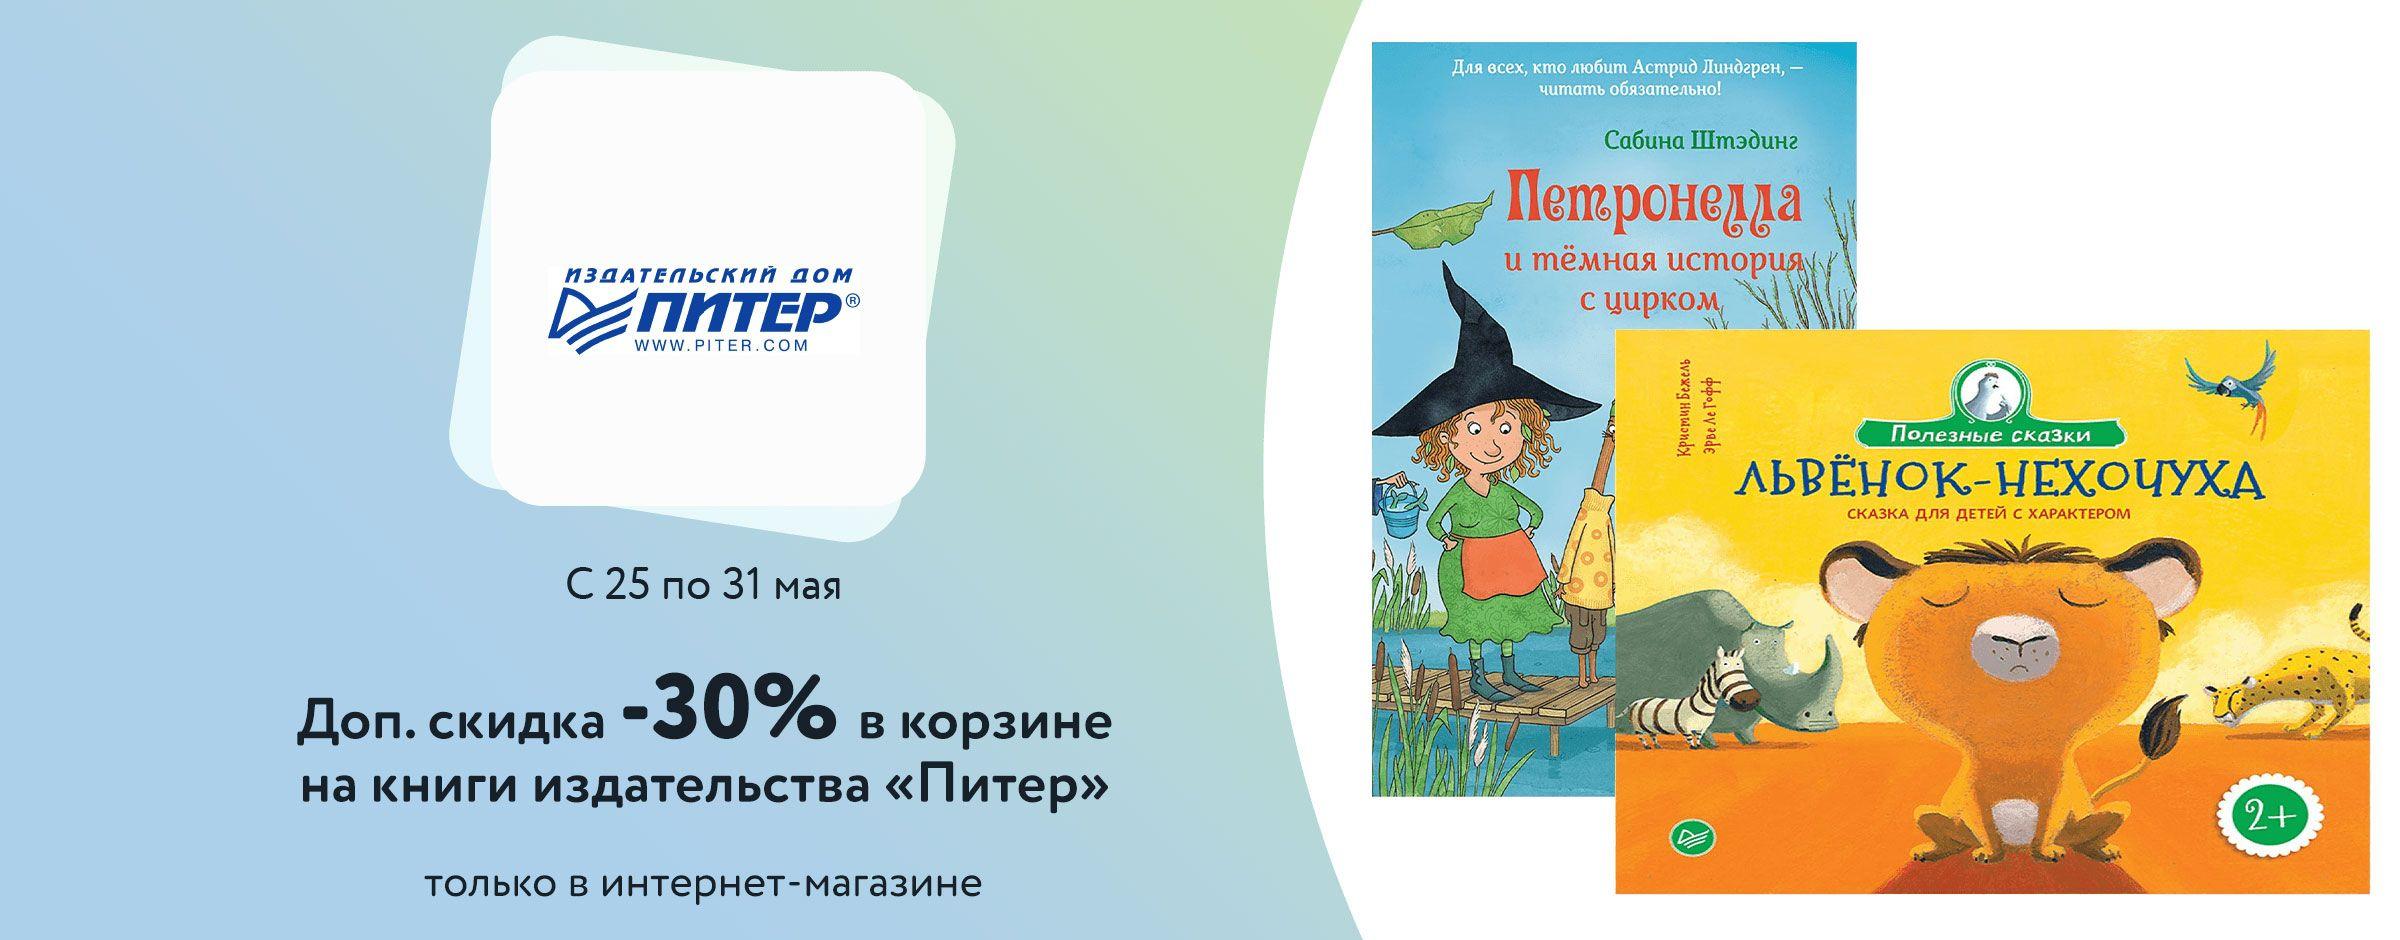 30% на книги Питер в корзине Кибер